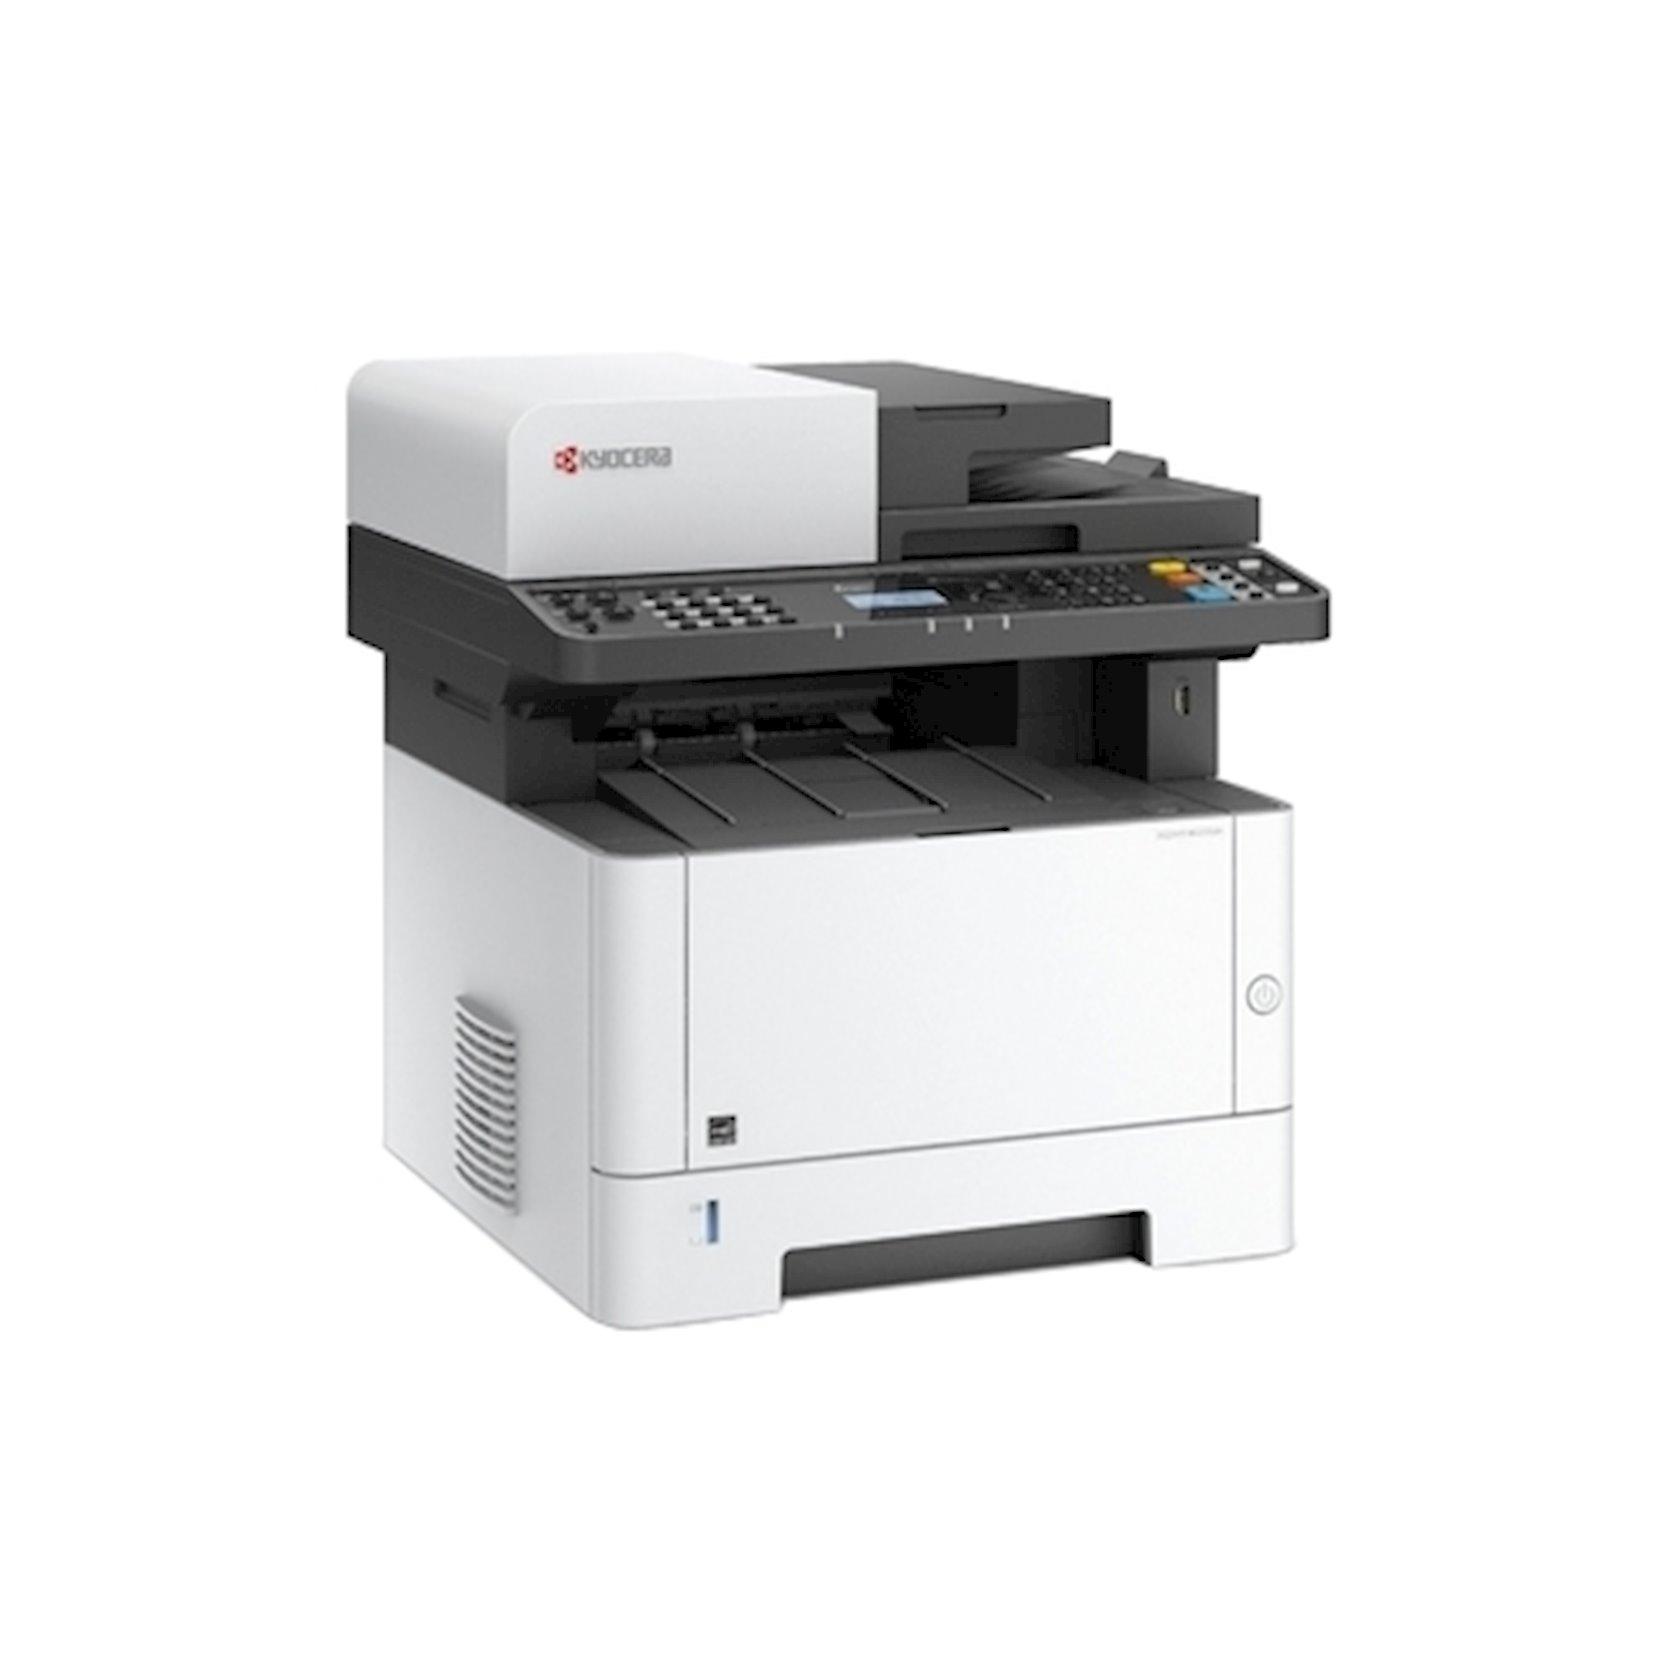 Printer Kyocera Ecosys M2235dn